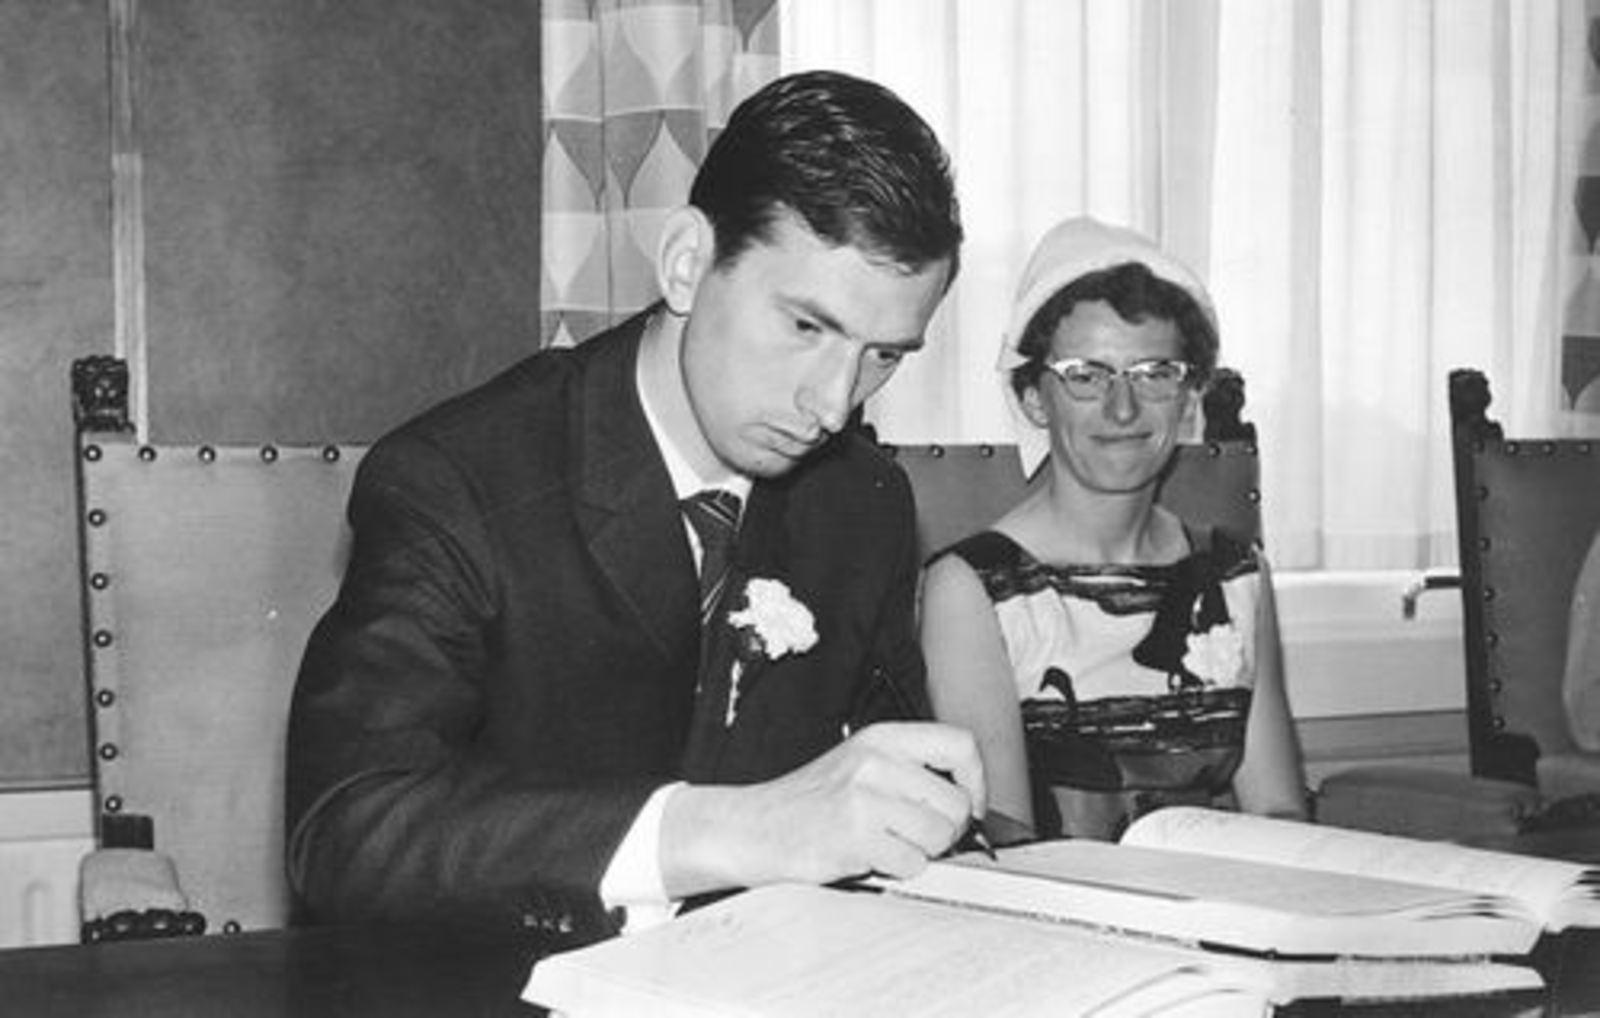 Dam Johanna M 1935 19__ trouwt Jacobus Bonte 04